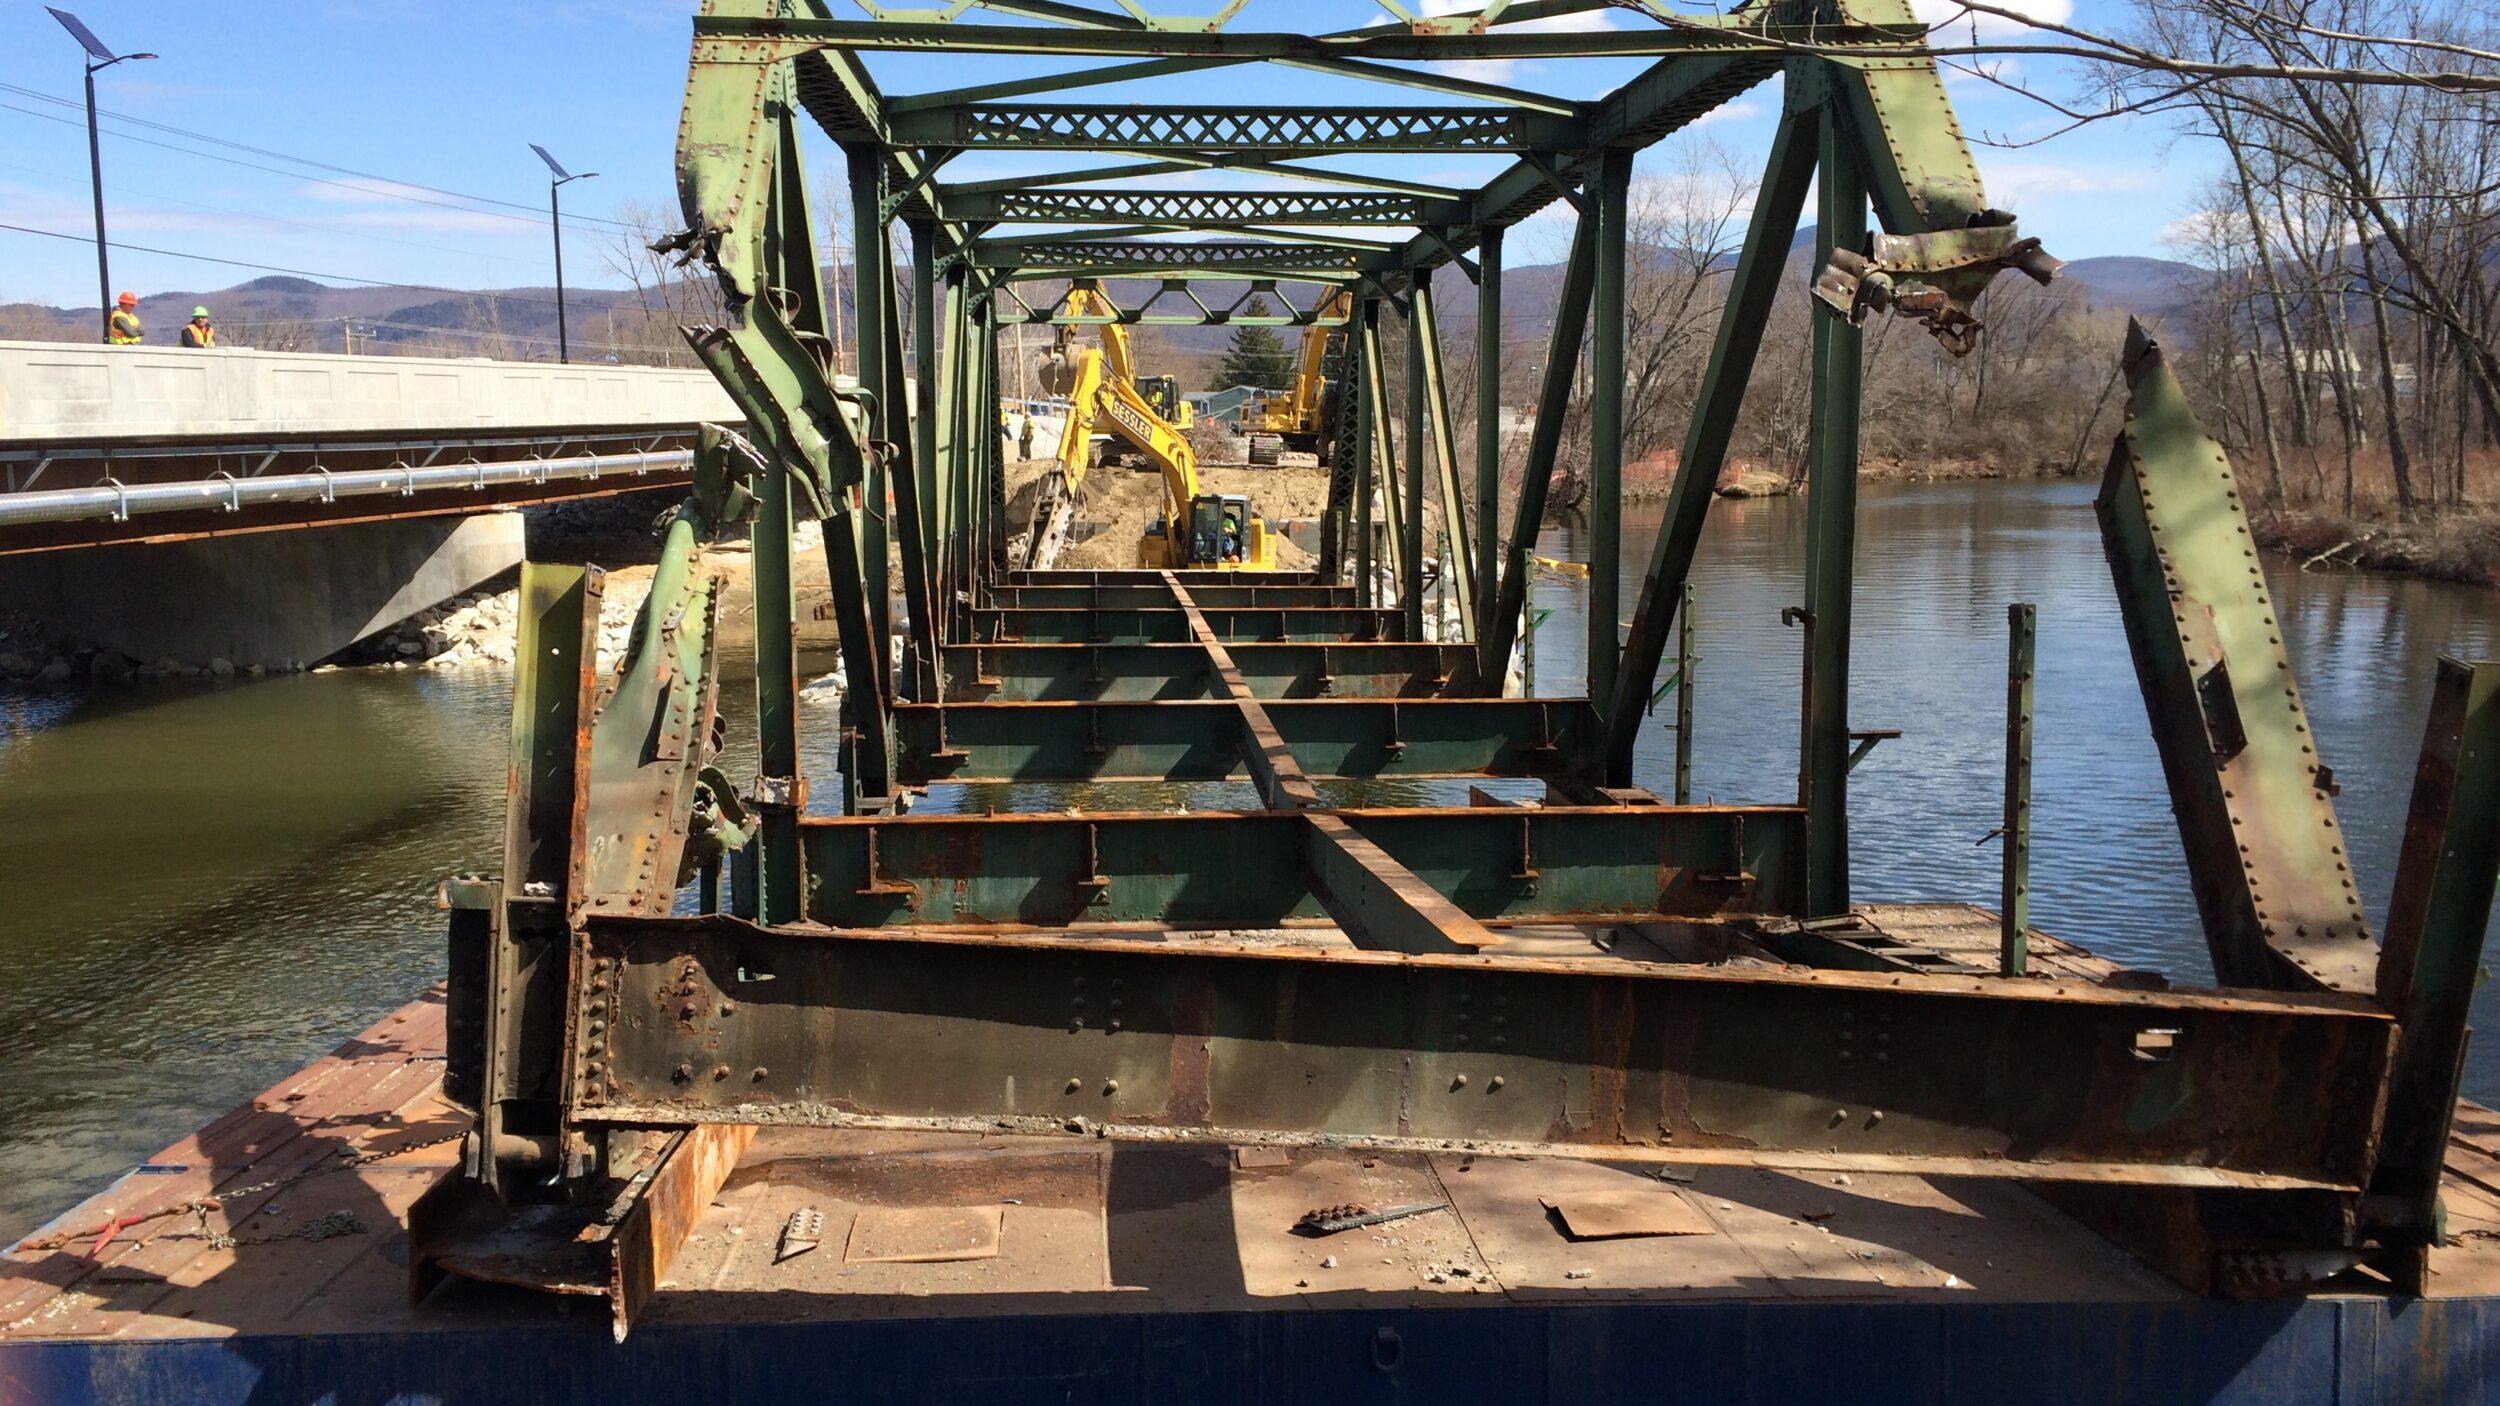 View looking through truss bridge